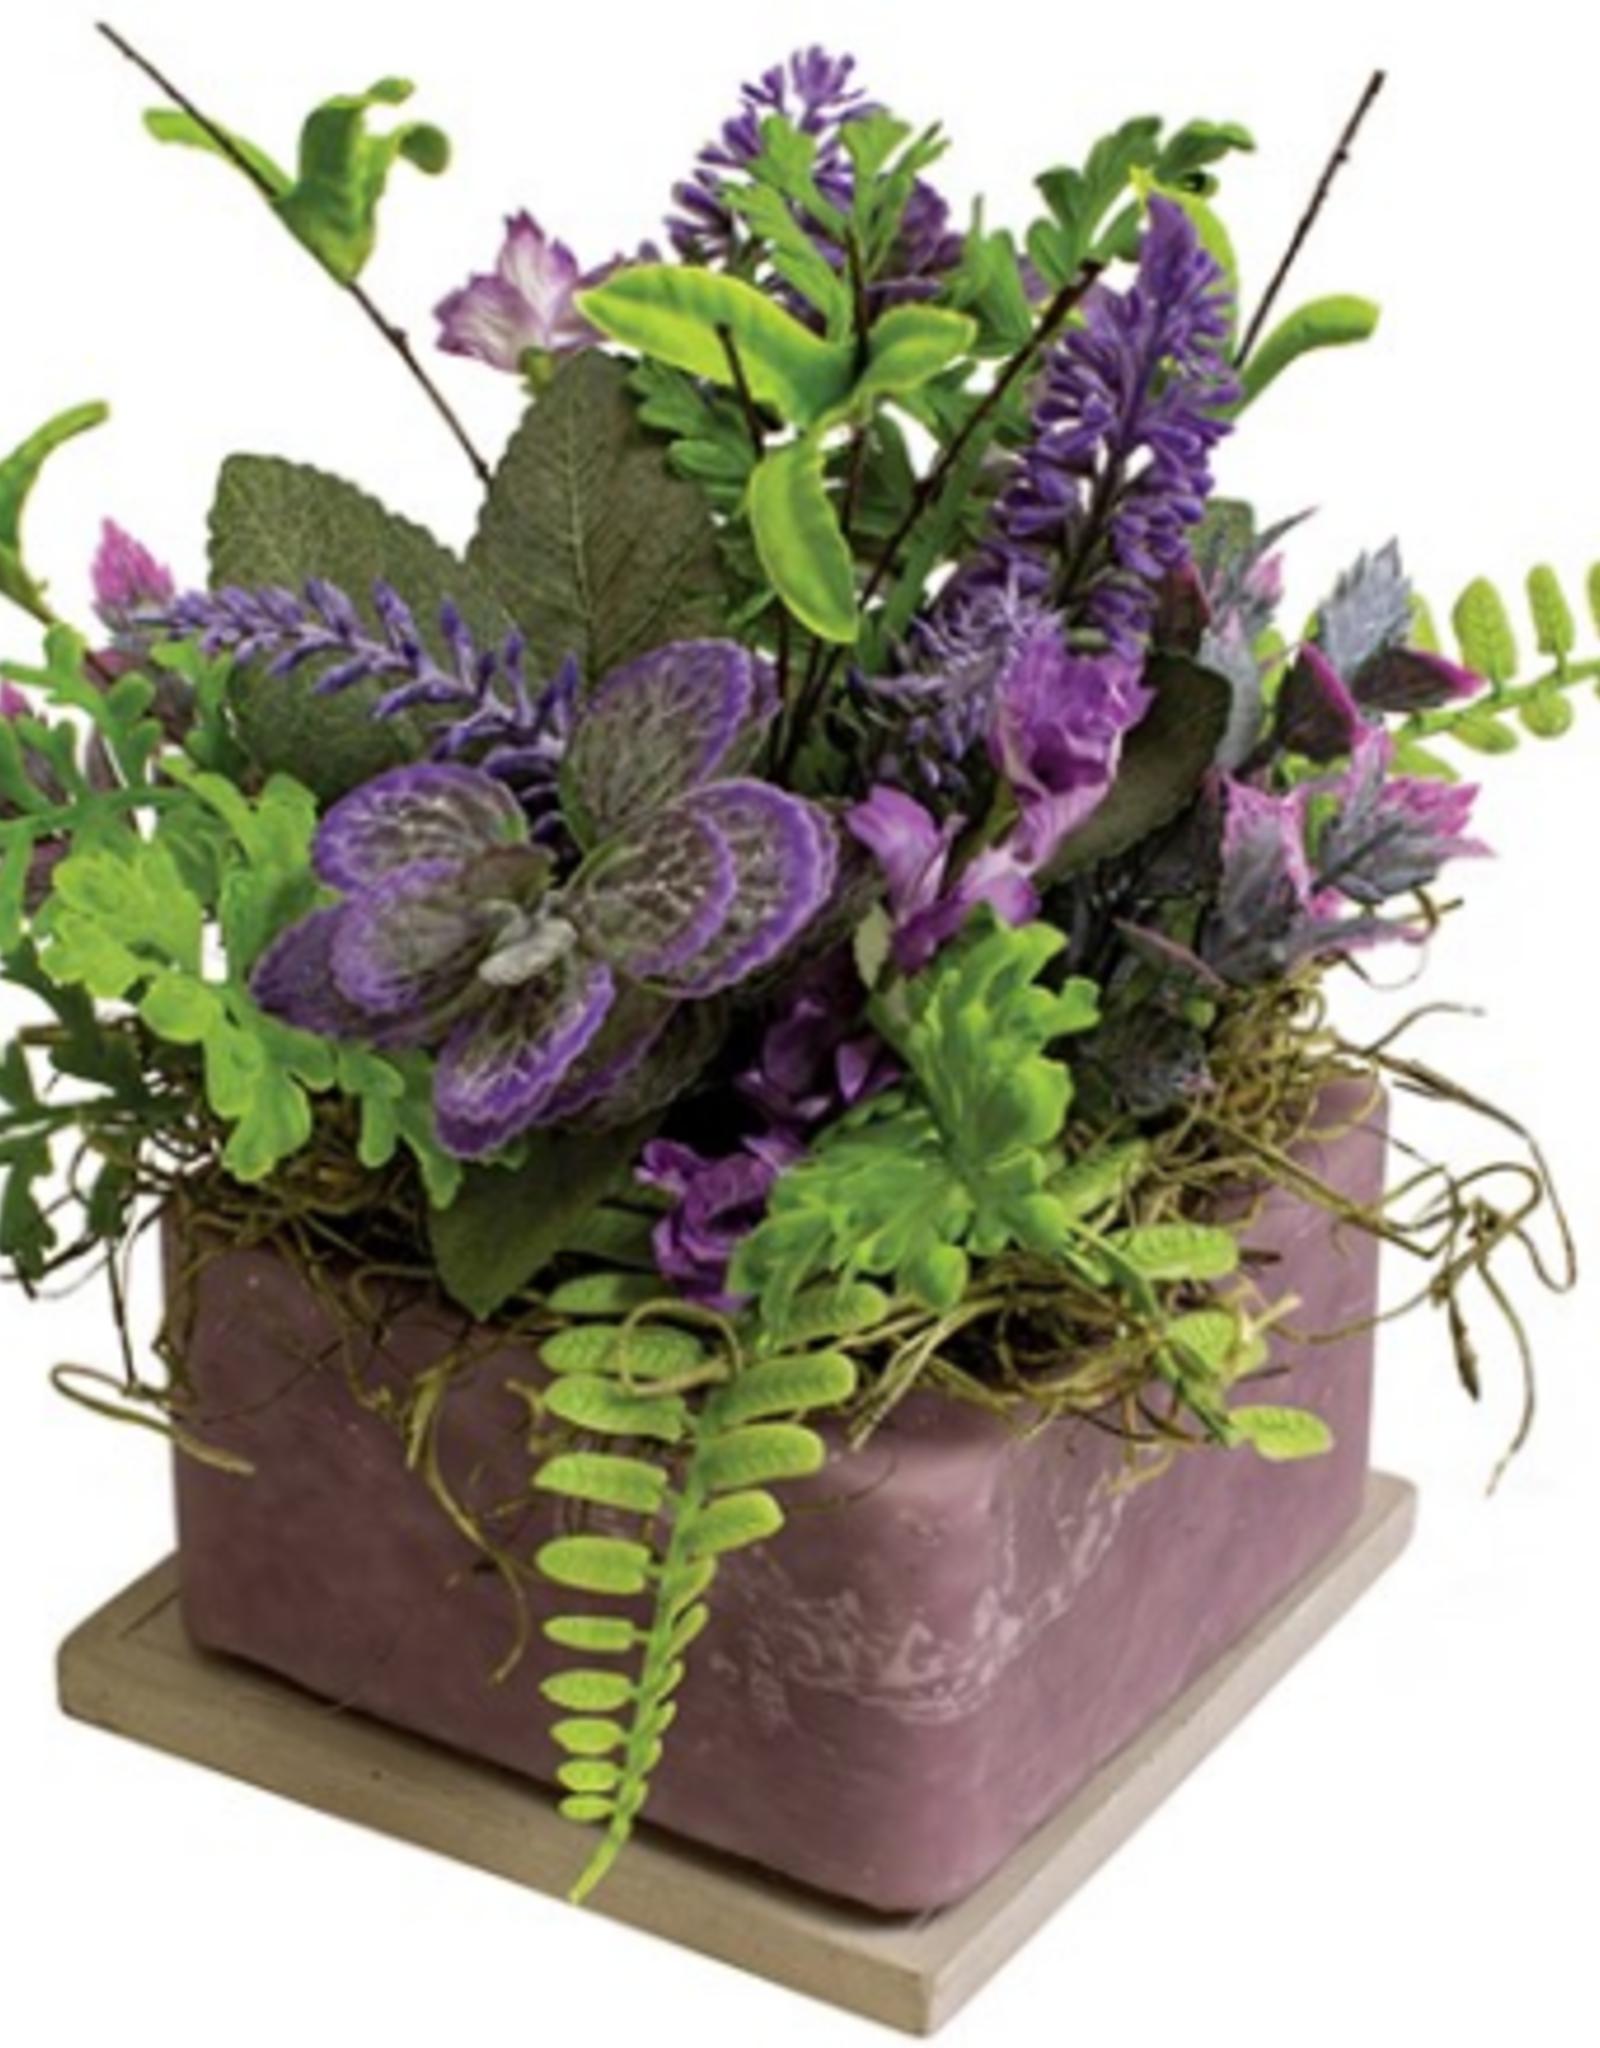 Habersham Candle Co. Wax Geo, Lavender